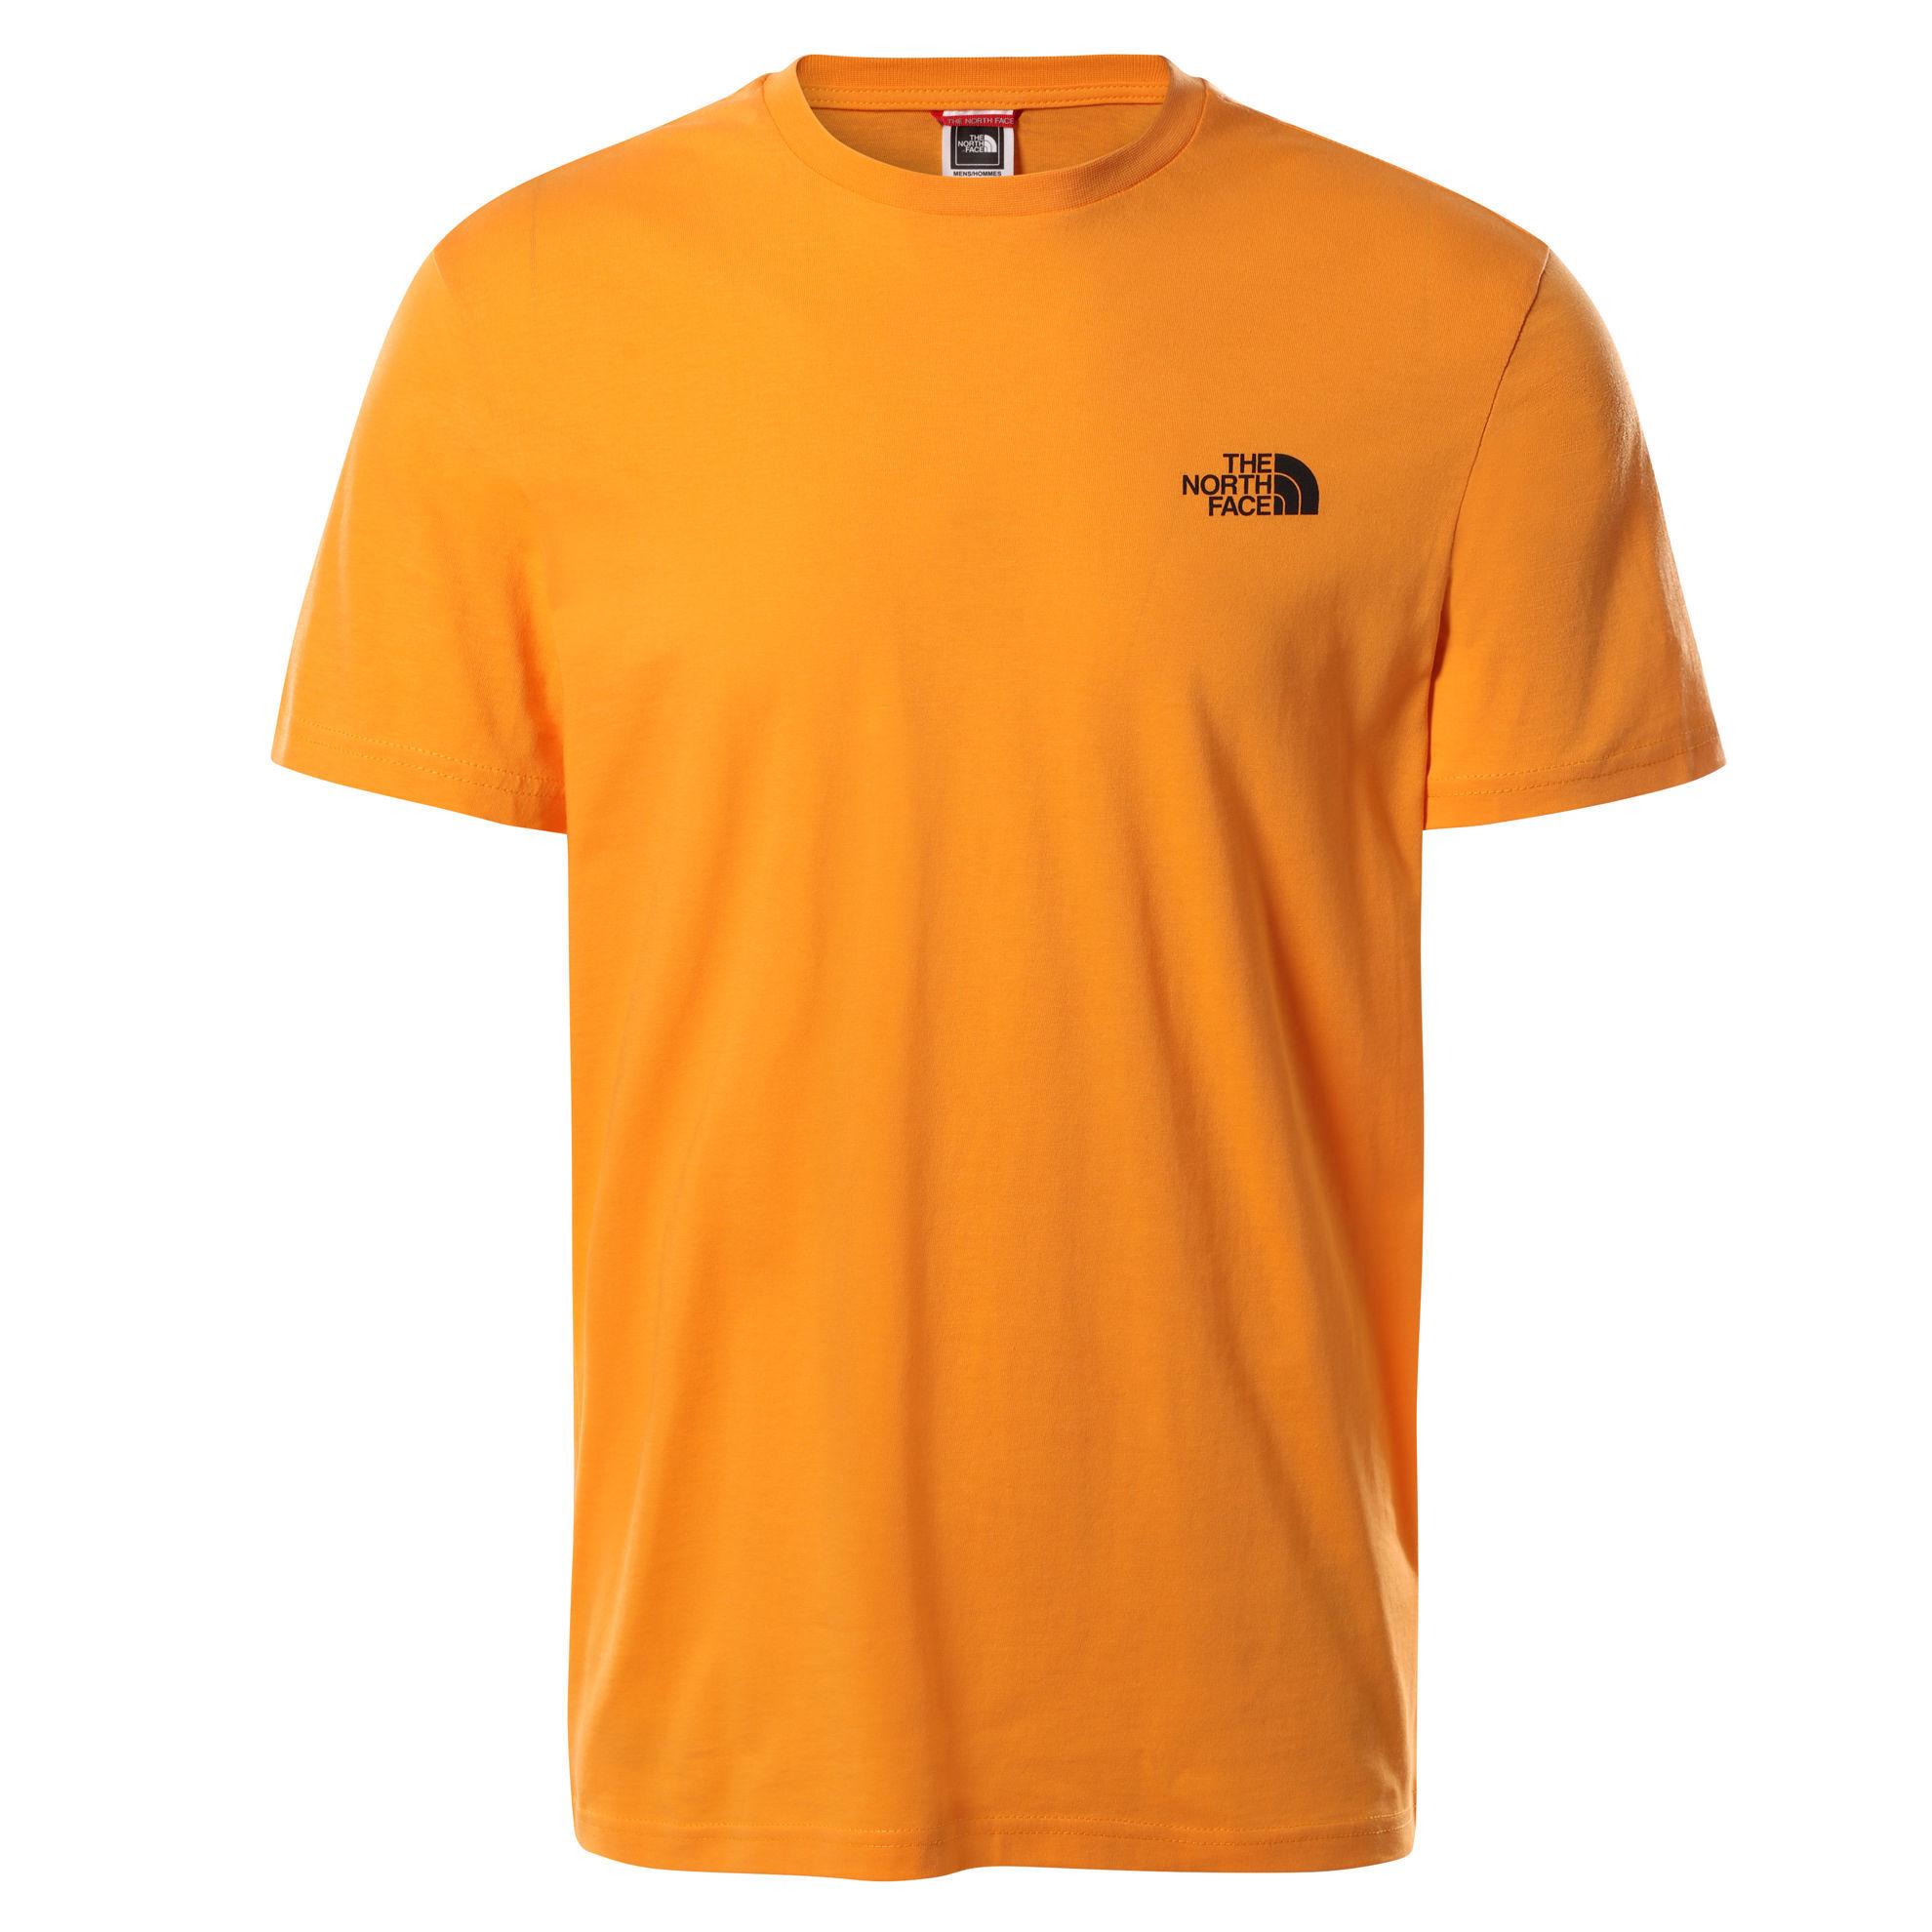 Bilde av The North Face  M S/S SIMPLE DOME TEE Light Exuberance Orange